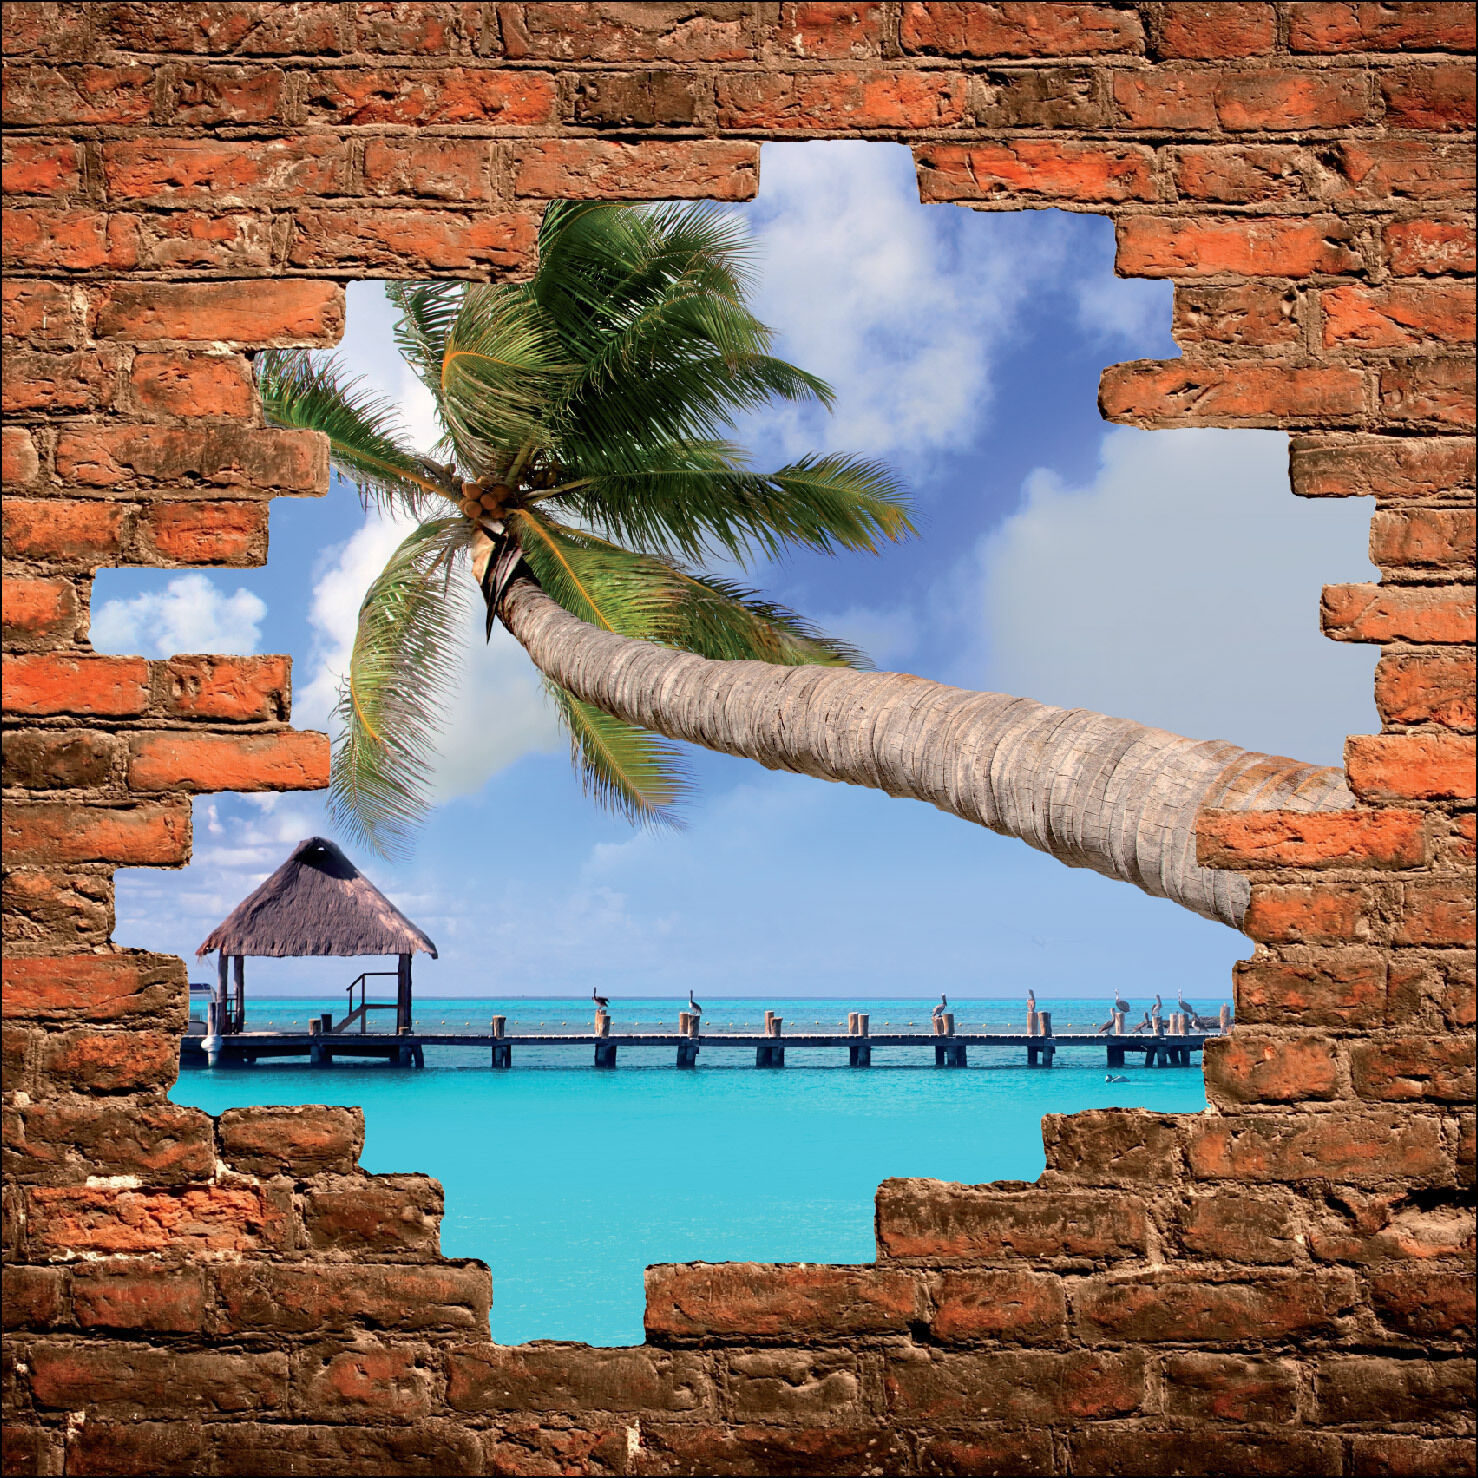 Adhesivo de pared trampantojo piedra Deco la trópicos palmera ref 892